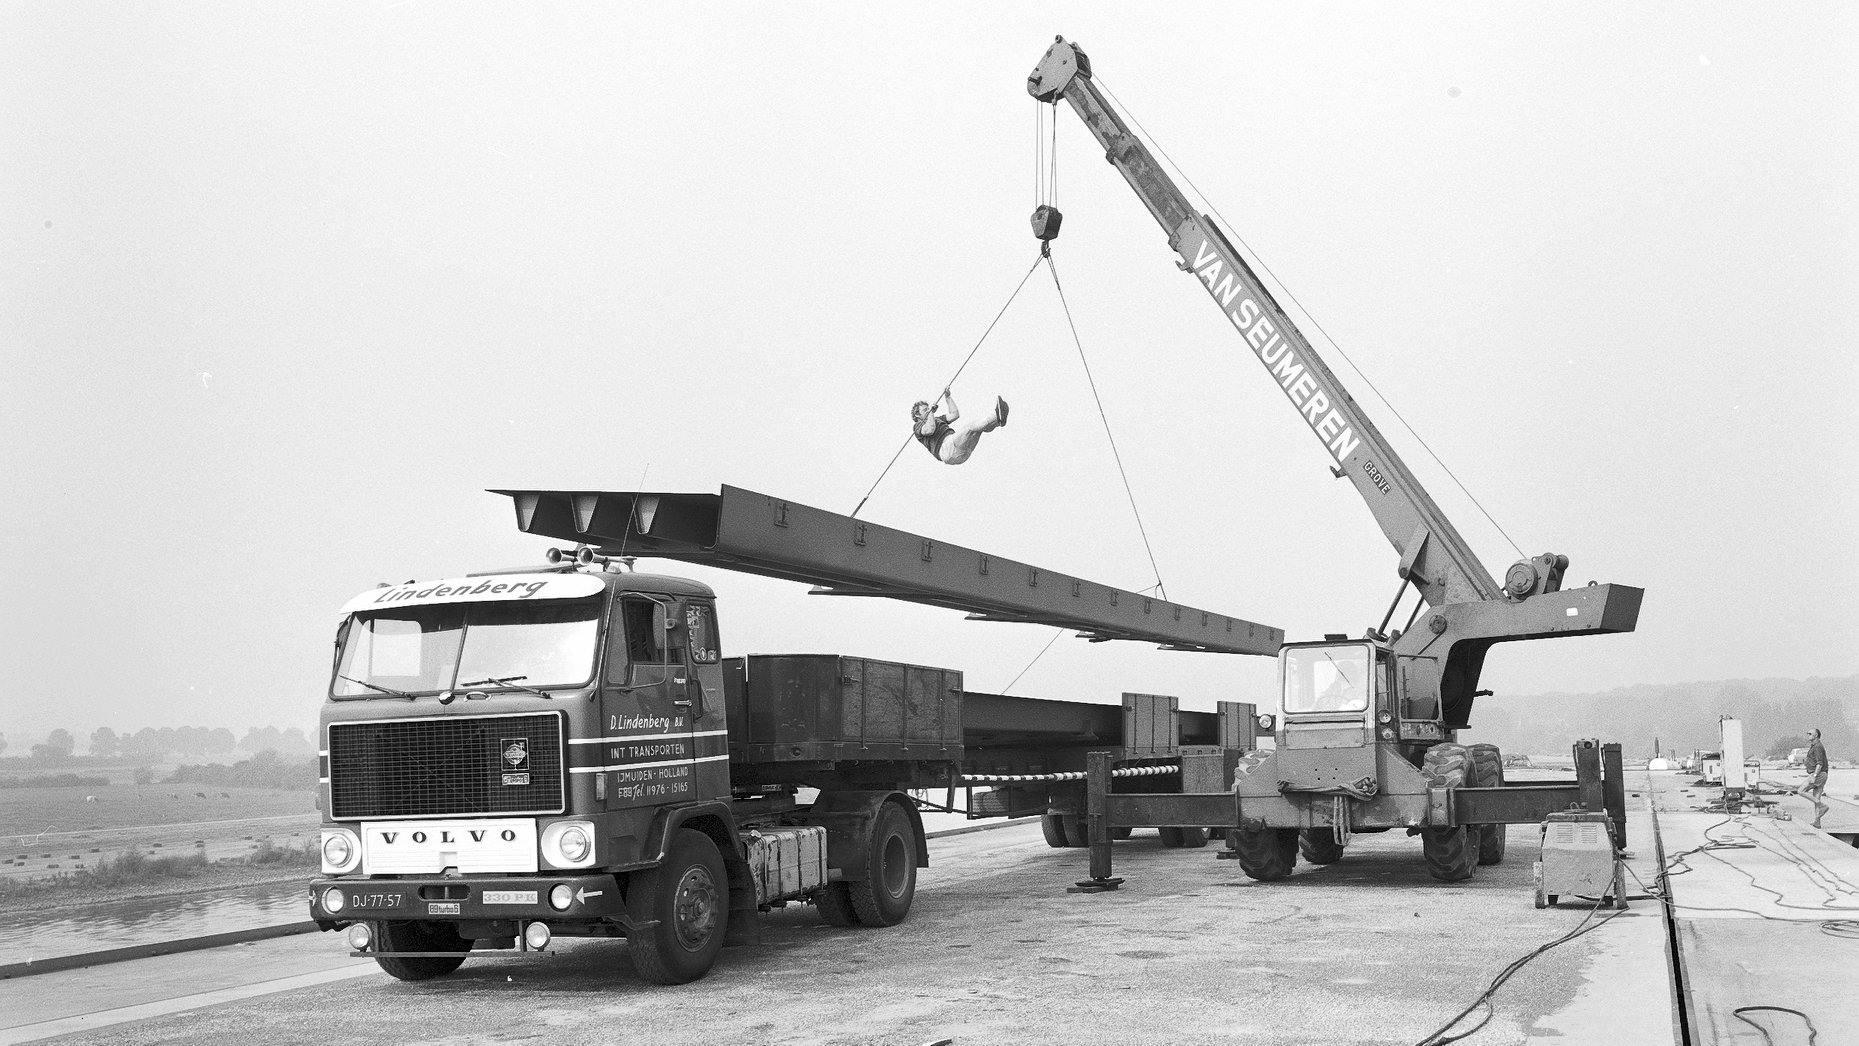 Volvo-F89-lengte-transport